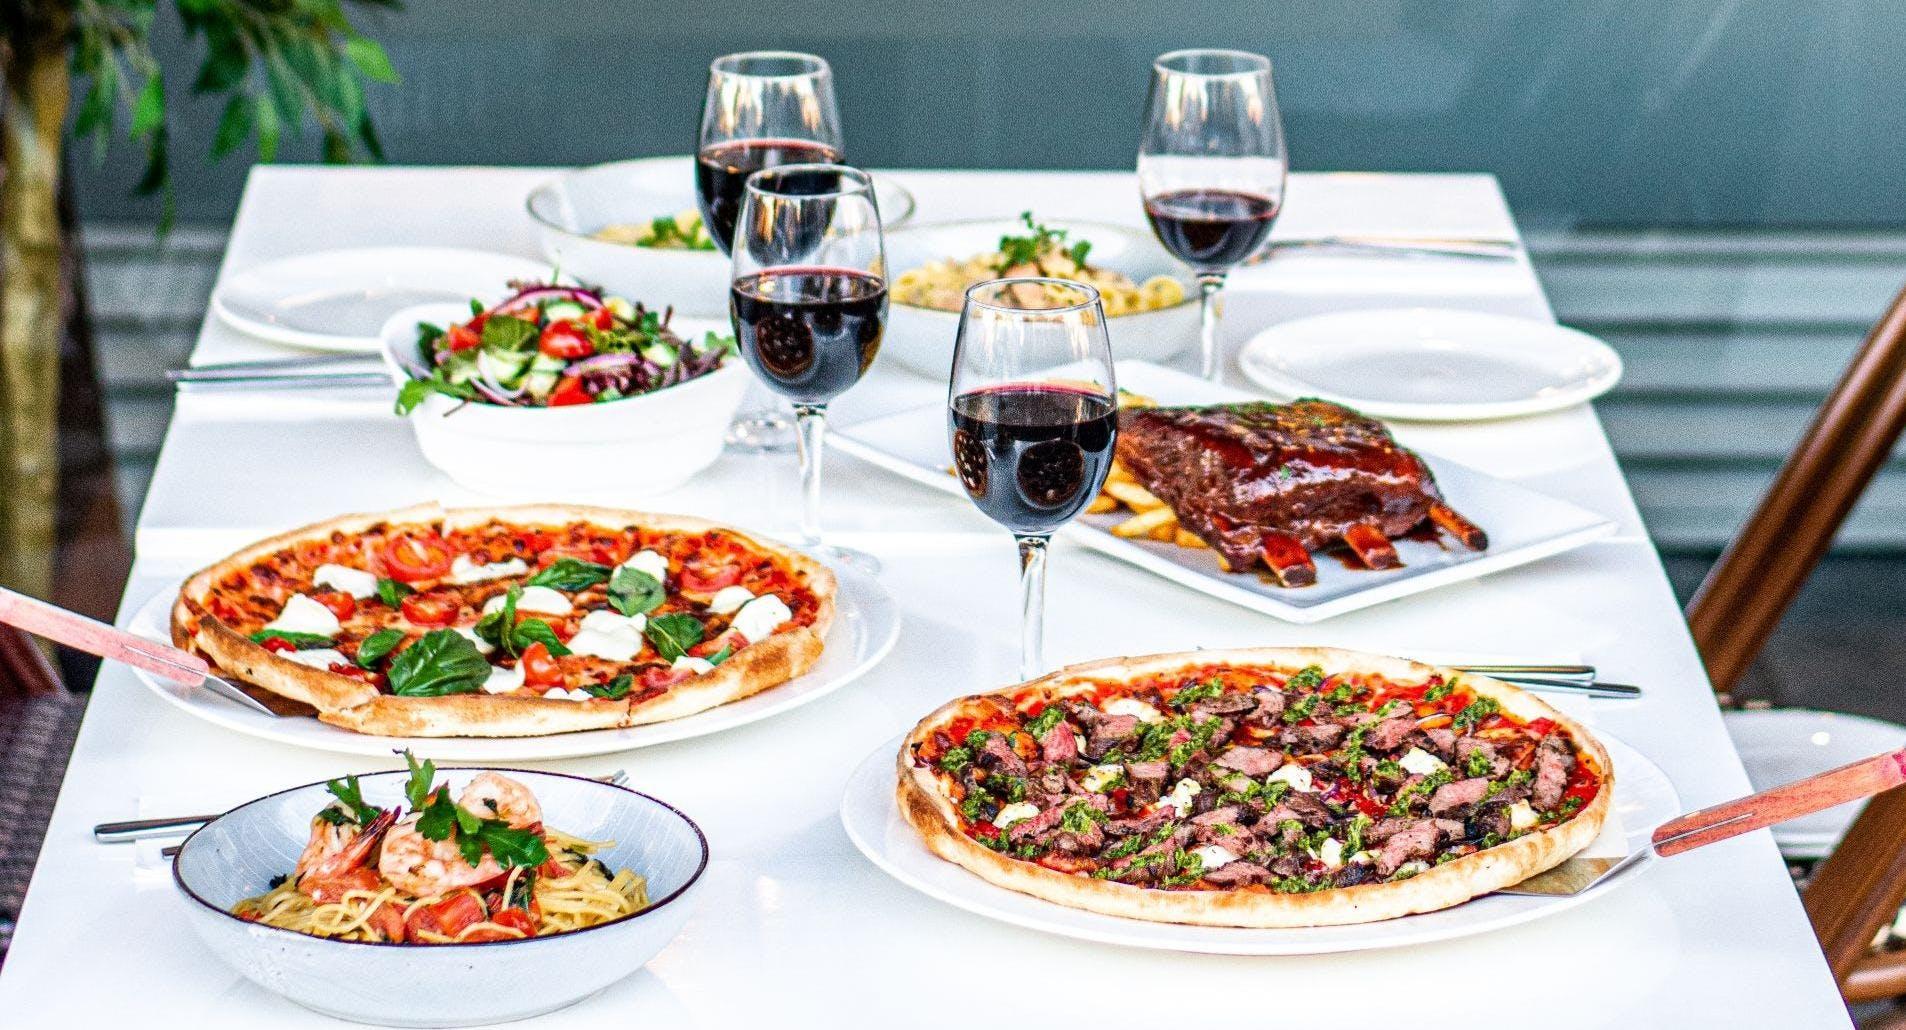 The Taste - Italian Grill